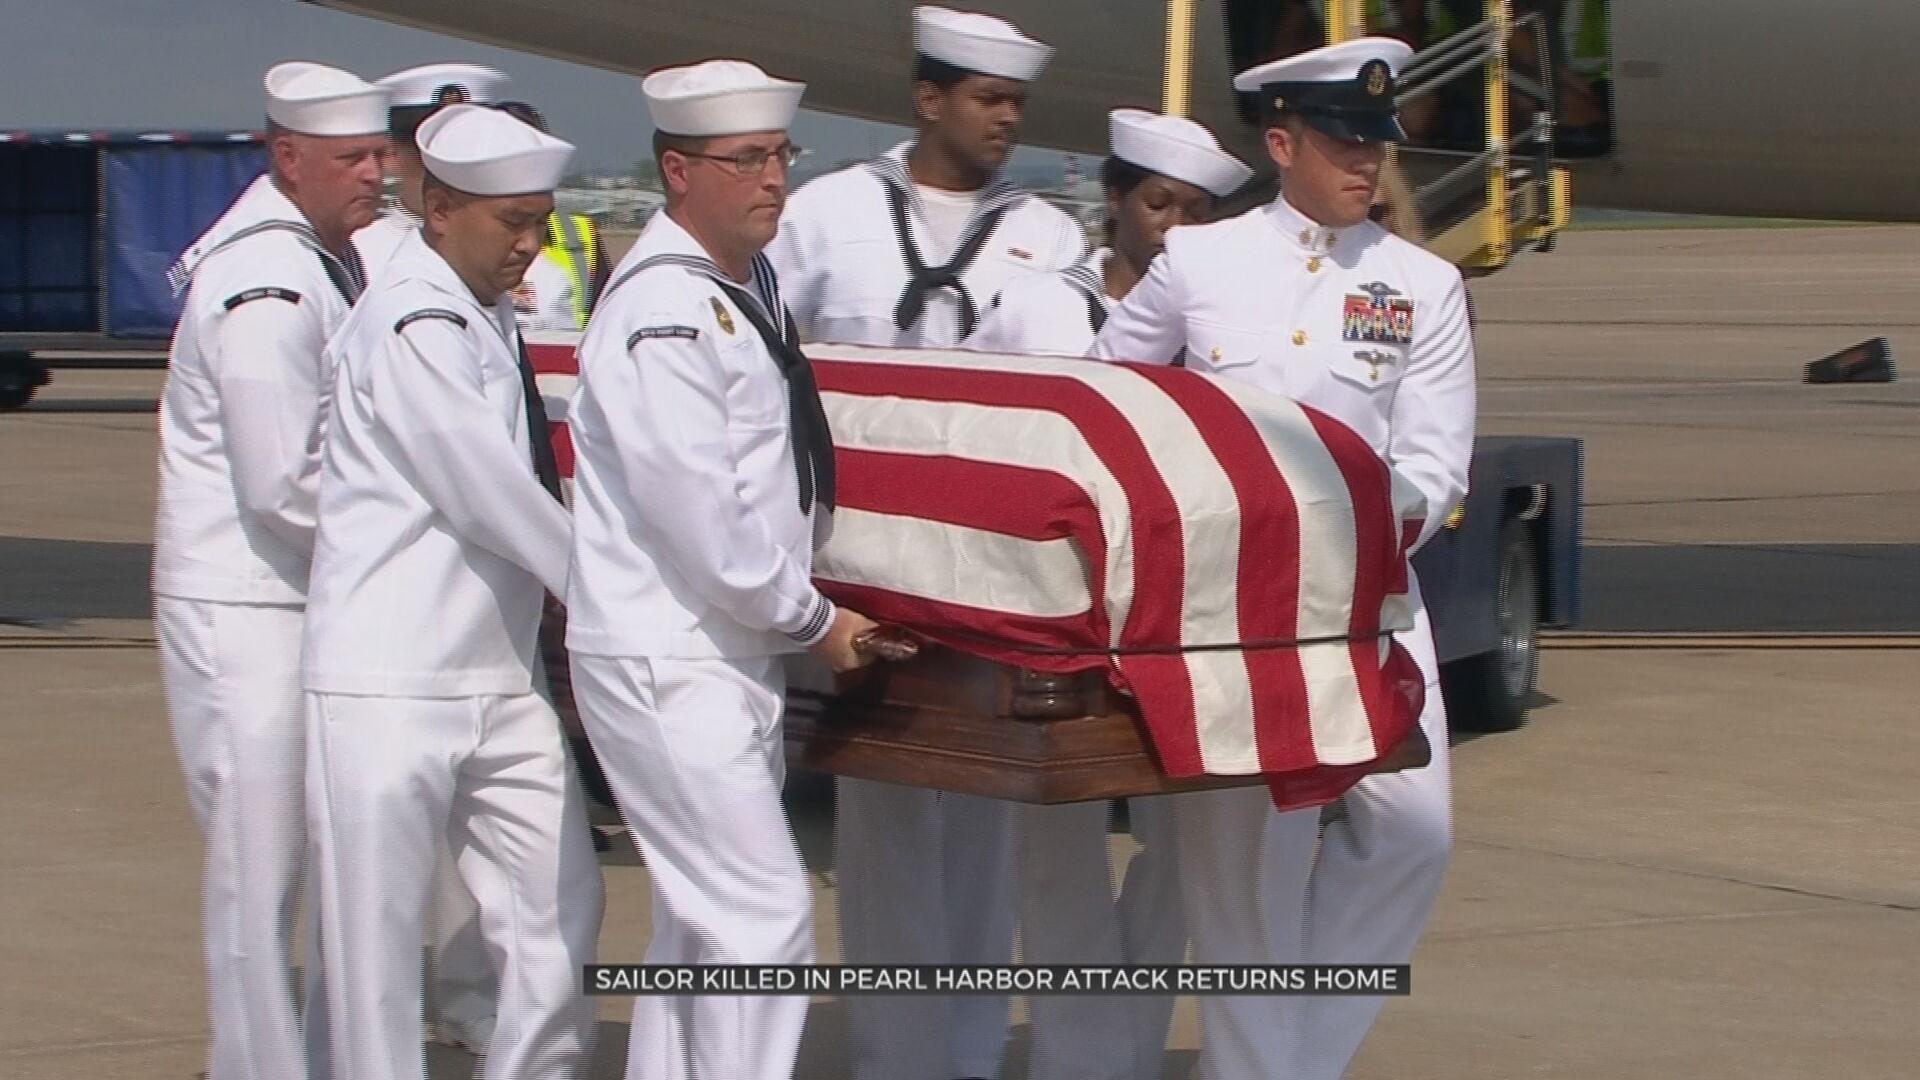 Sailor Killed In Pearl Harbor Attack Returns Home